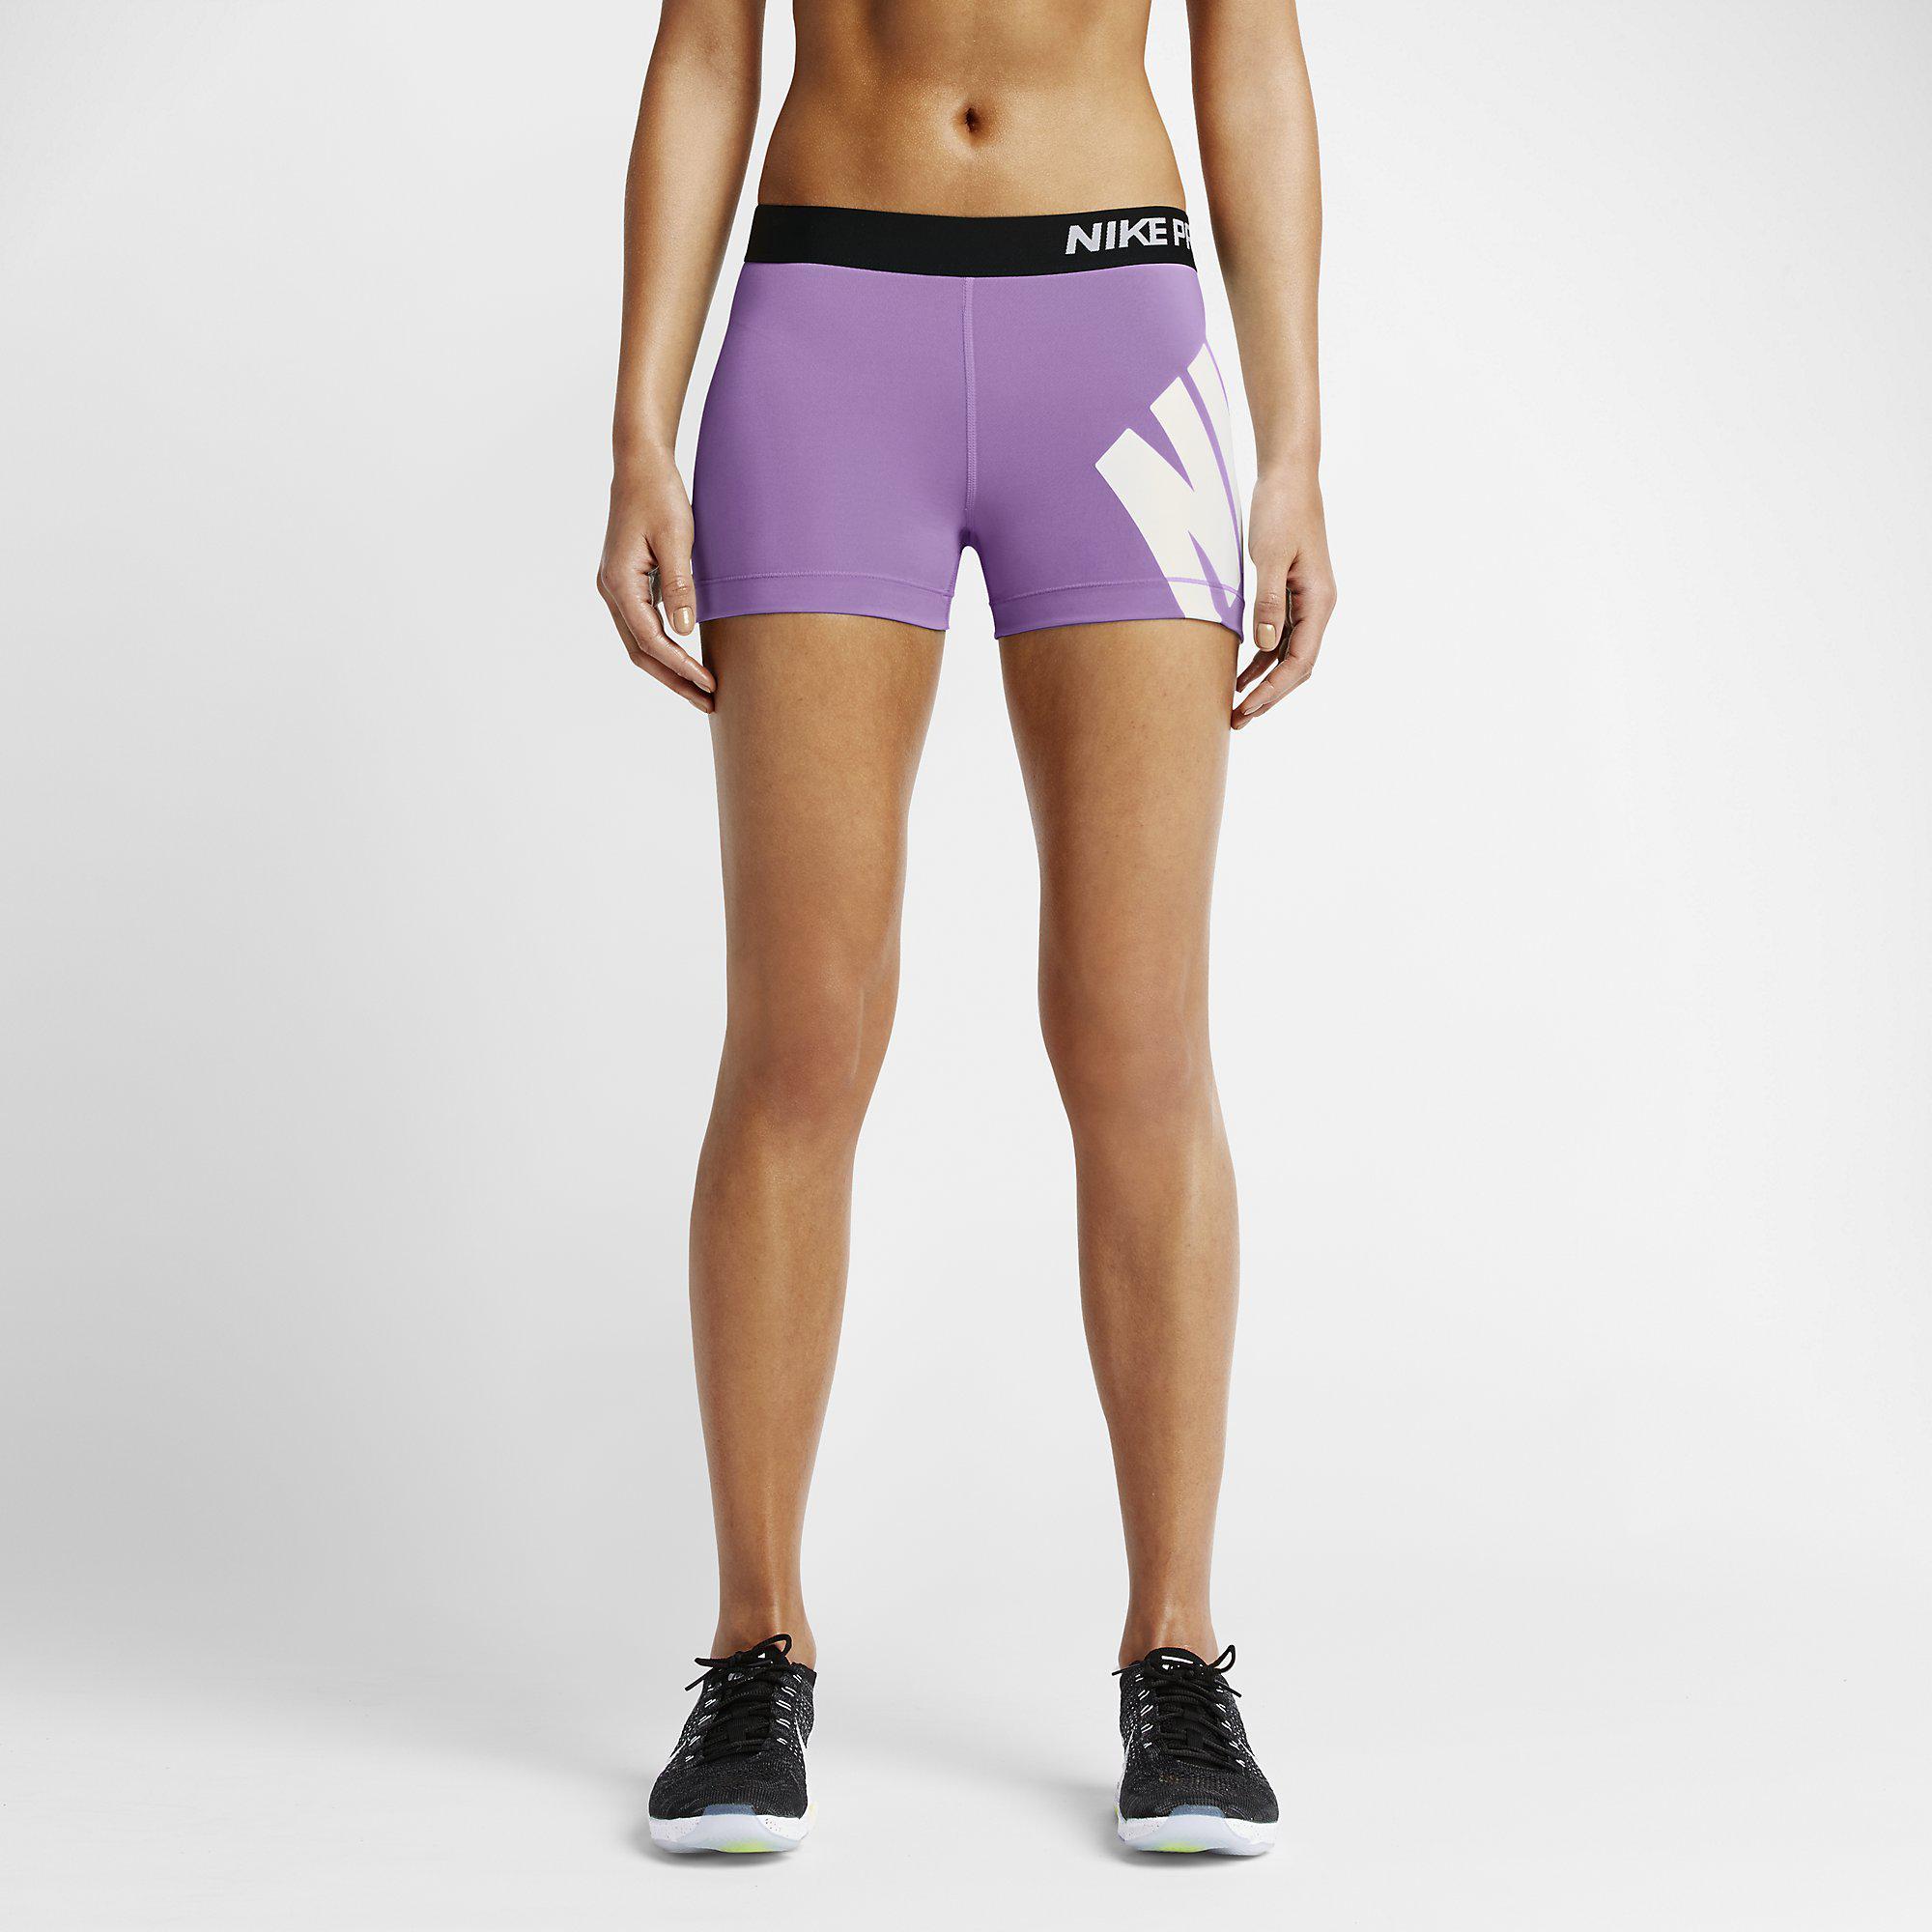 Nike Womens Pro 3 Inch Logo Training Shorts - Violet Shock Black ... e5118c173